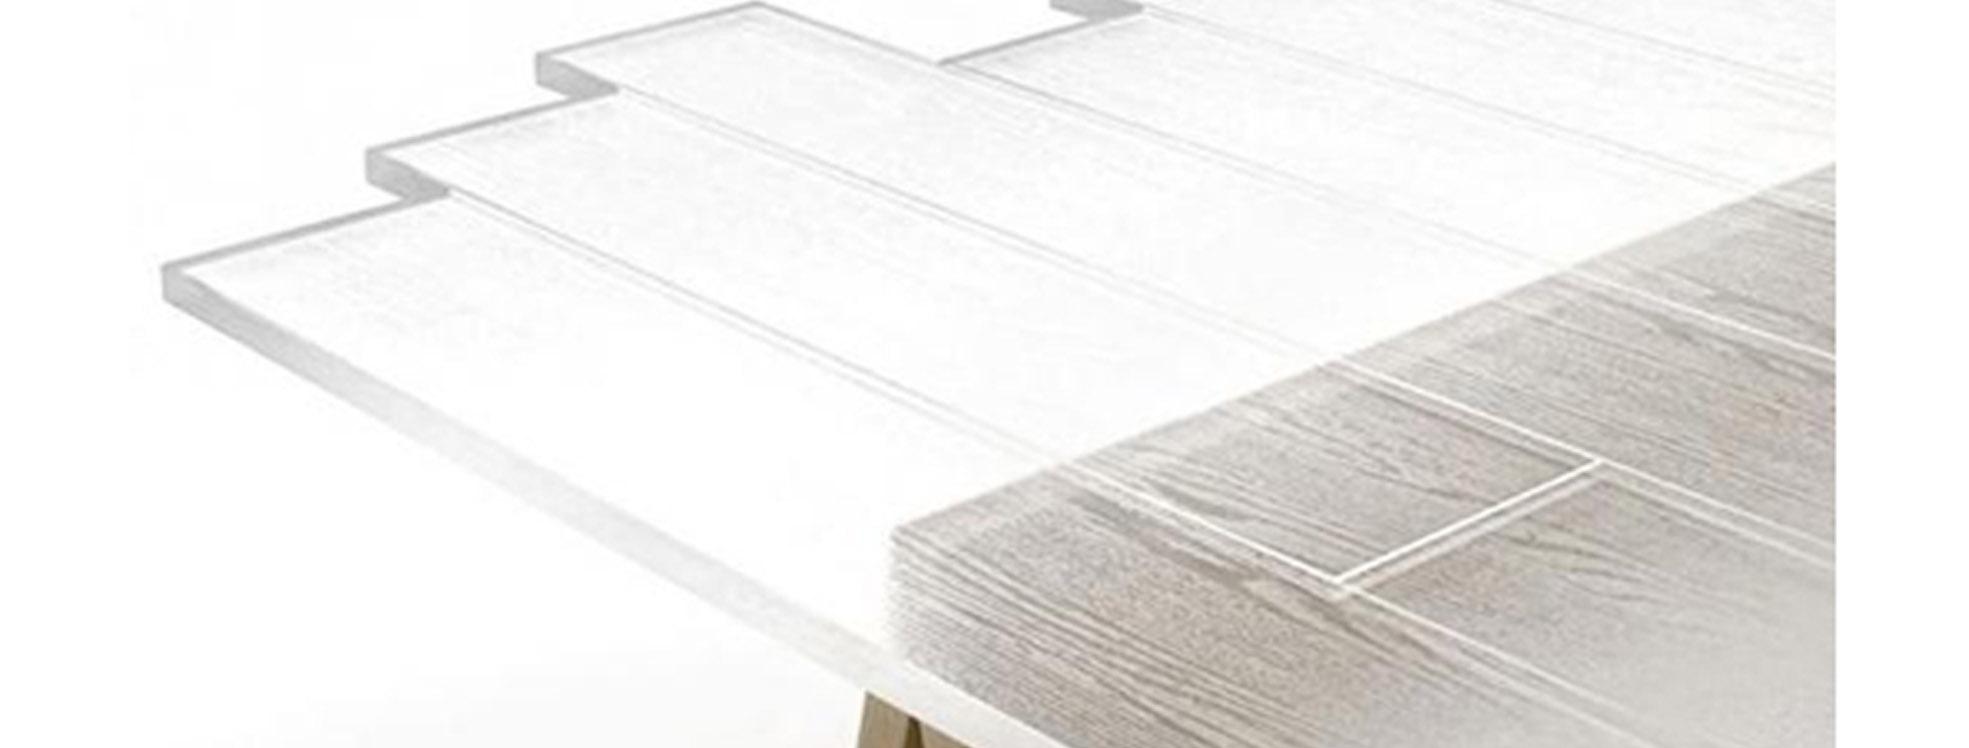 La madera transparente